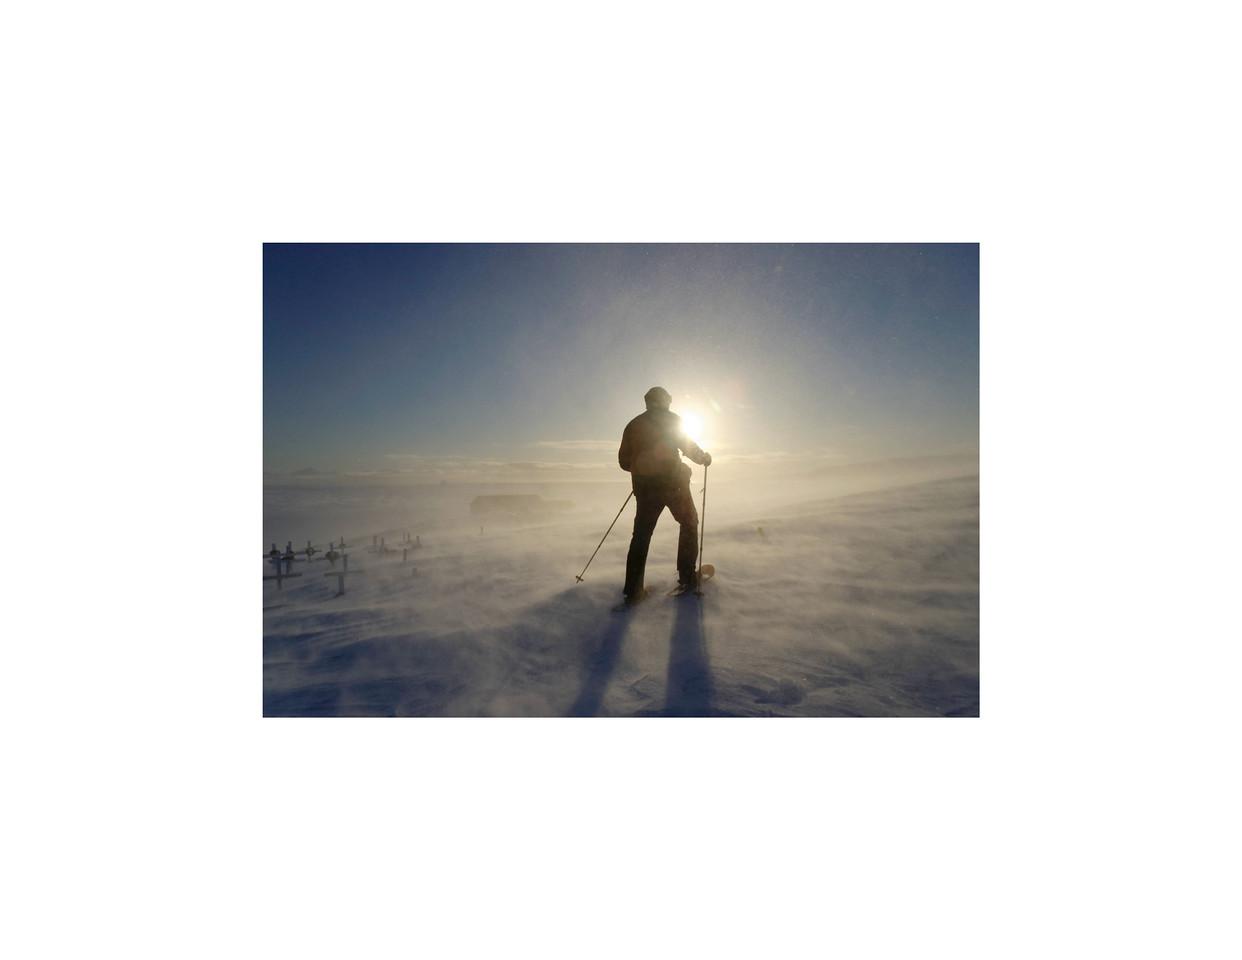 Winter in Northeast Greenland